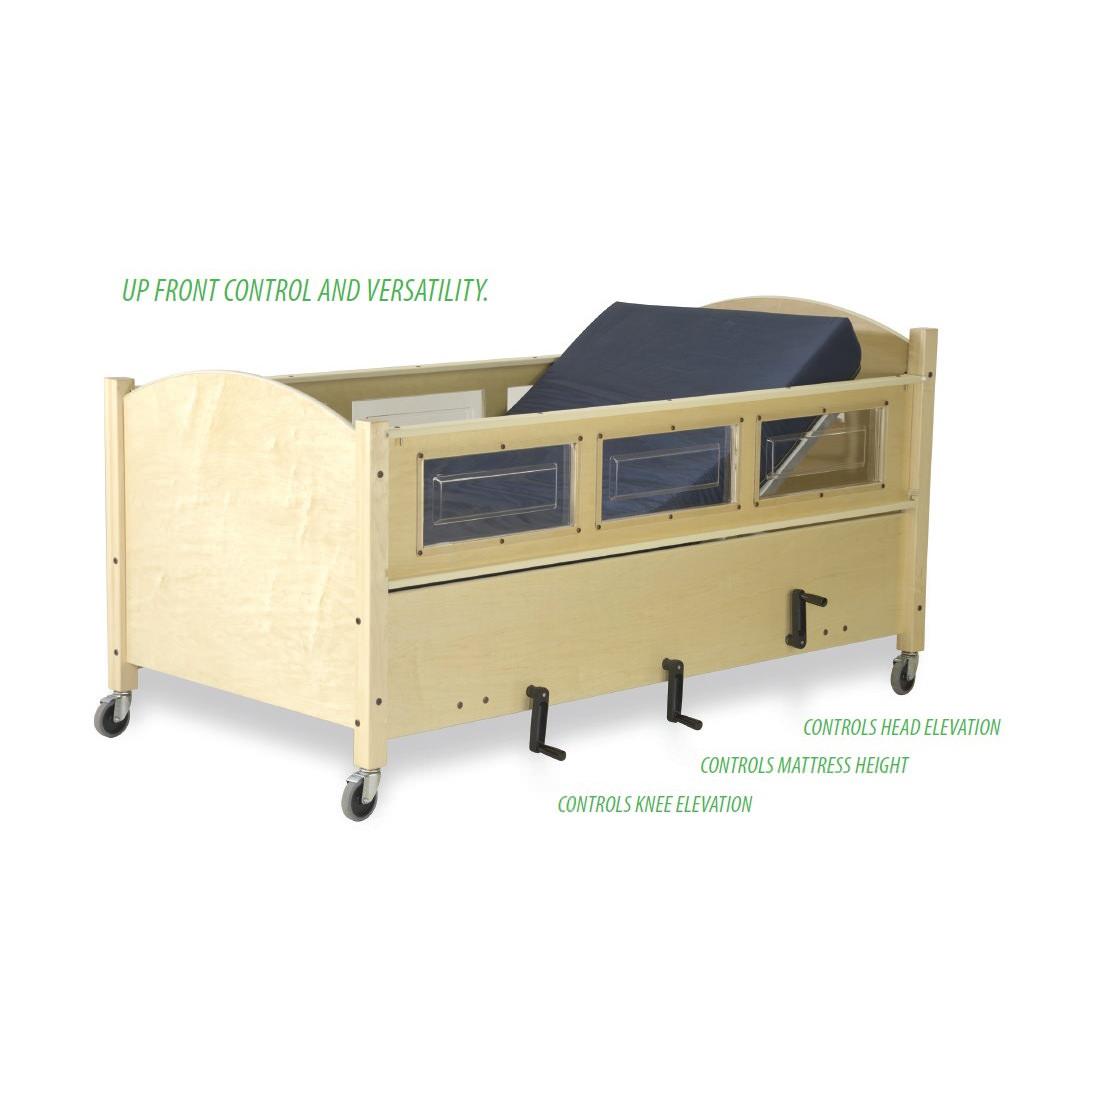 SleepSafe manual low bed